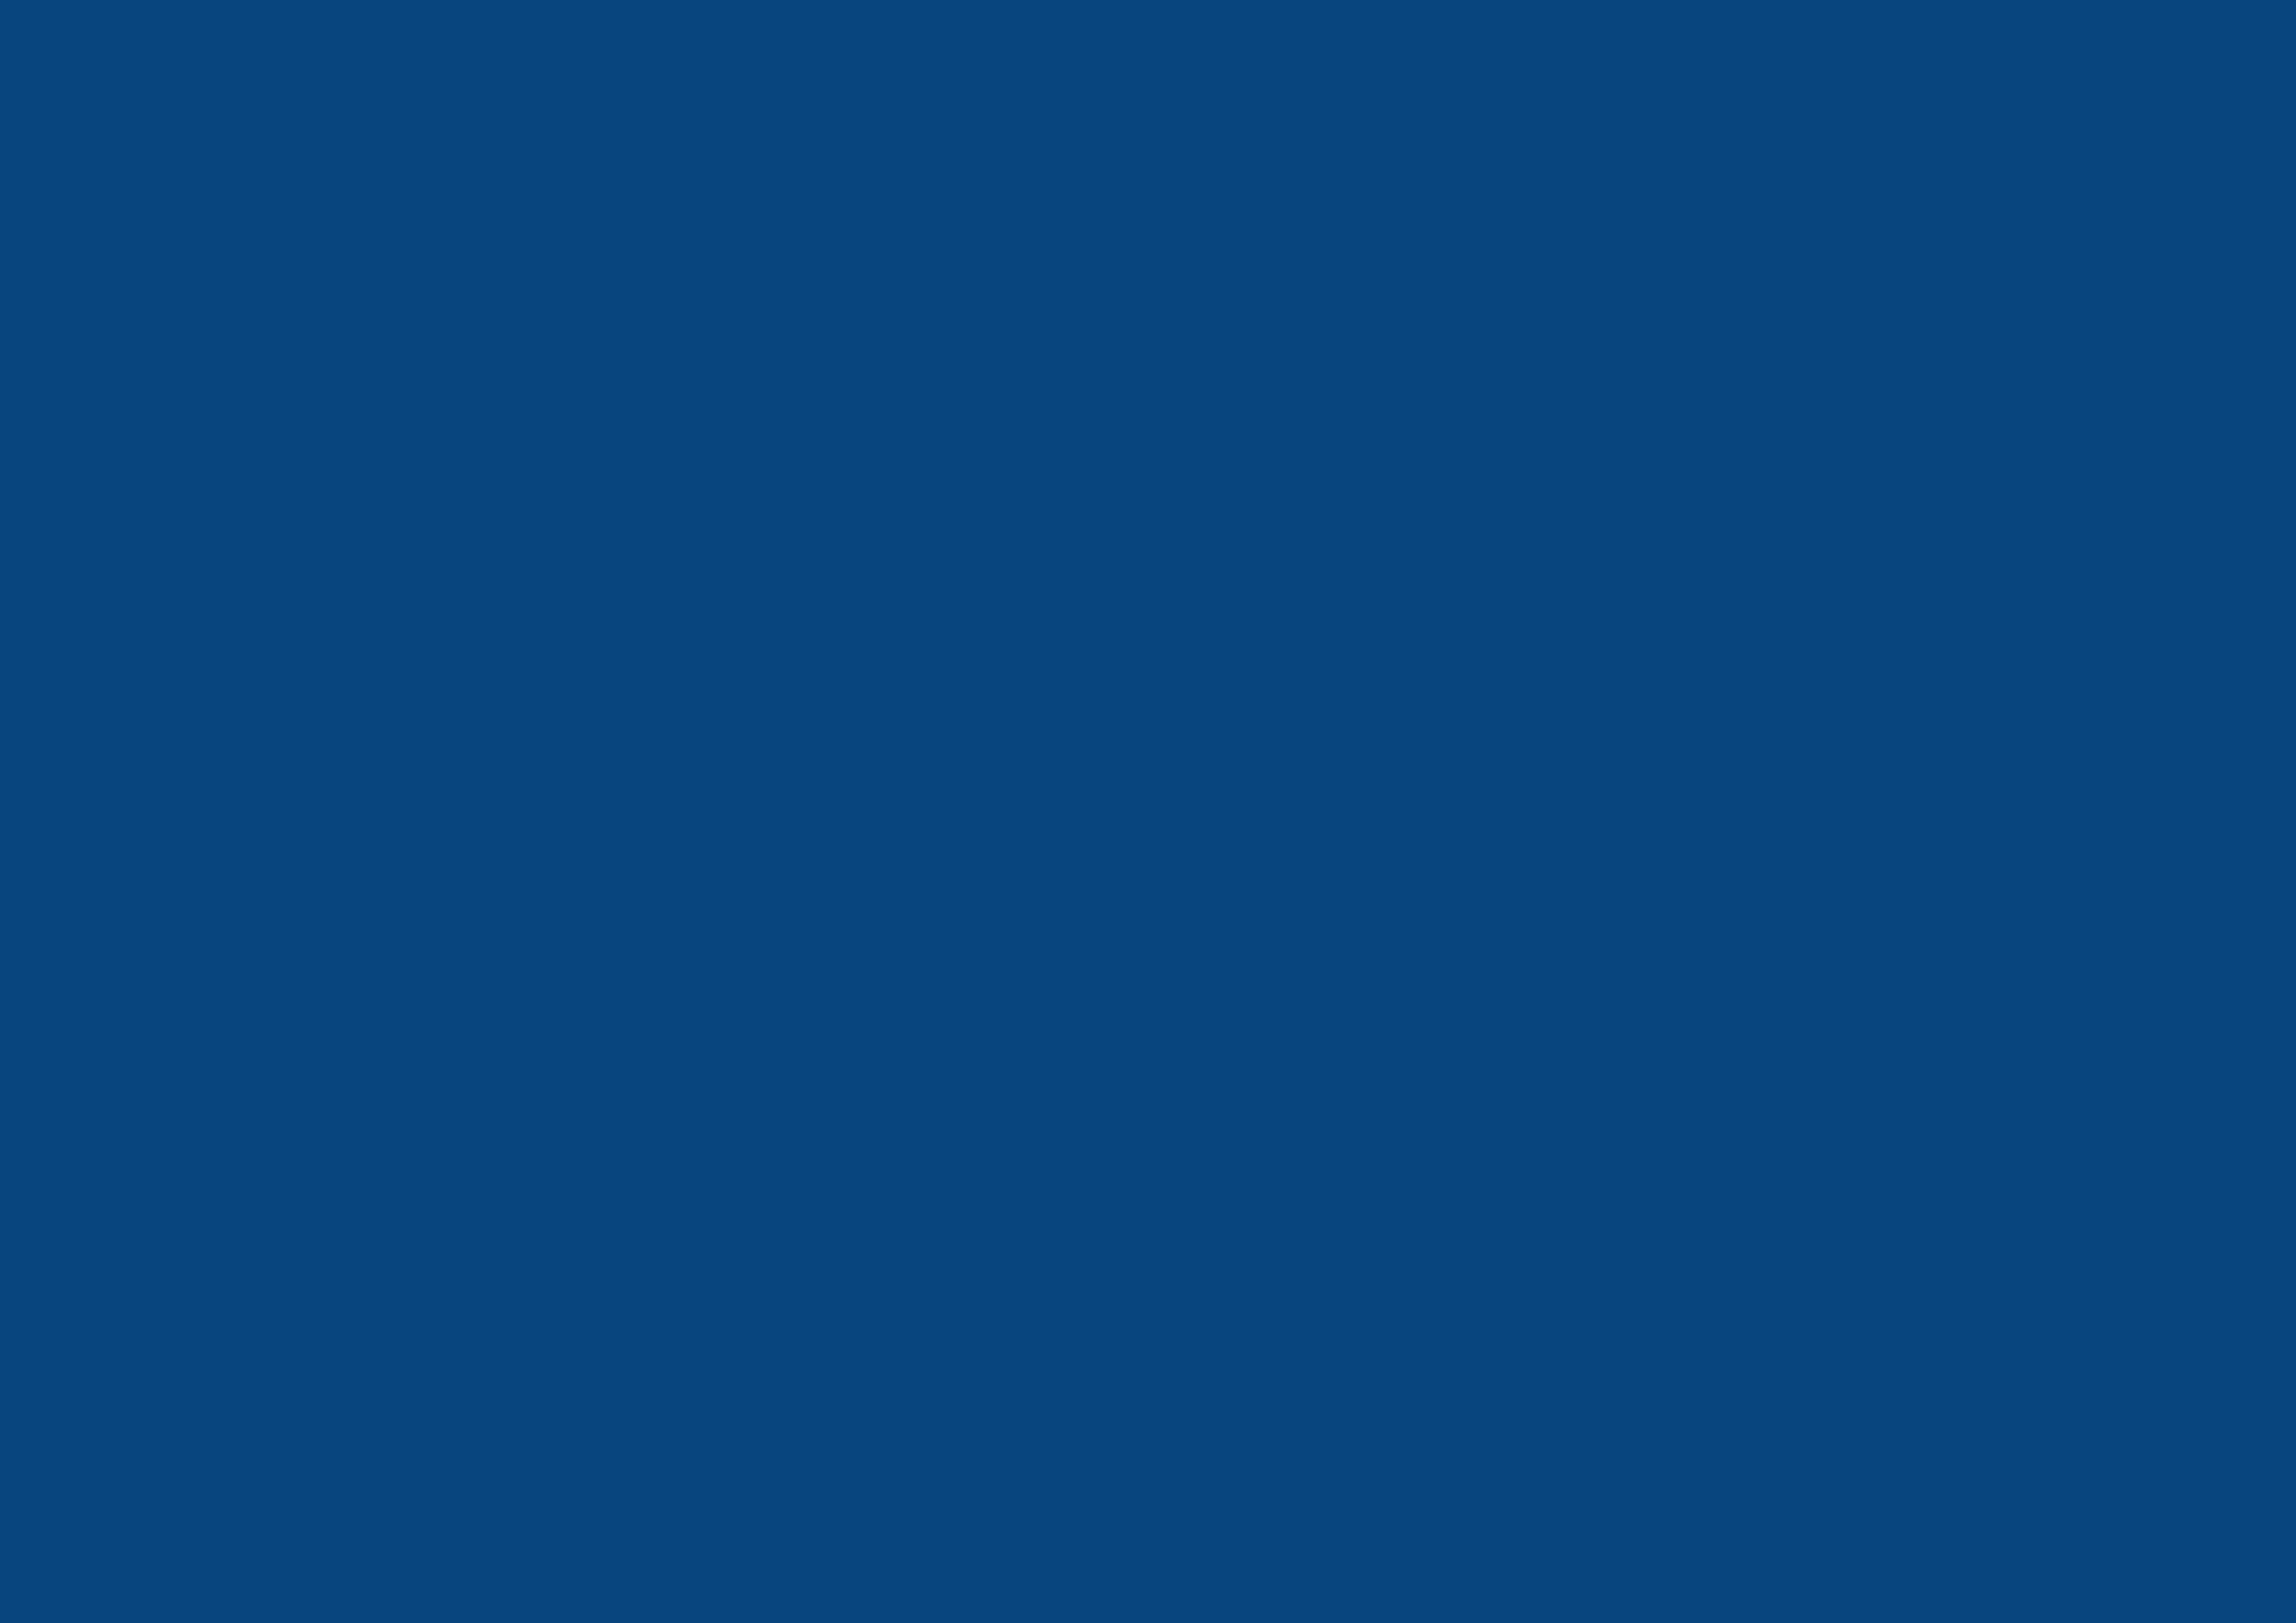 3508x2480 Dark Cerulean Solid Color Background